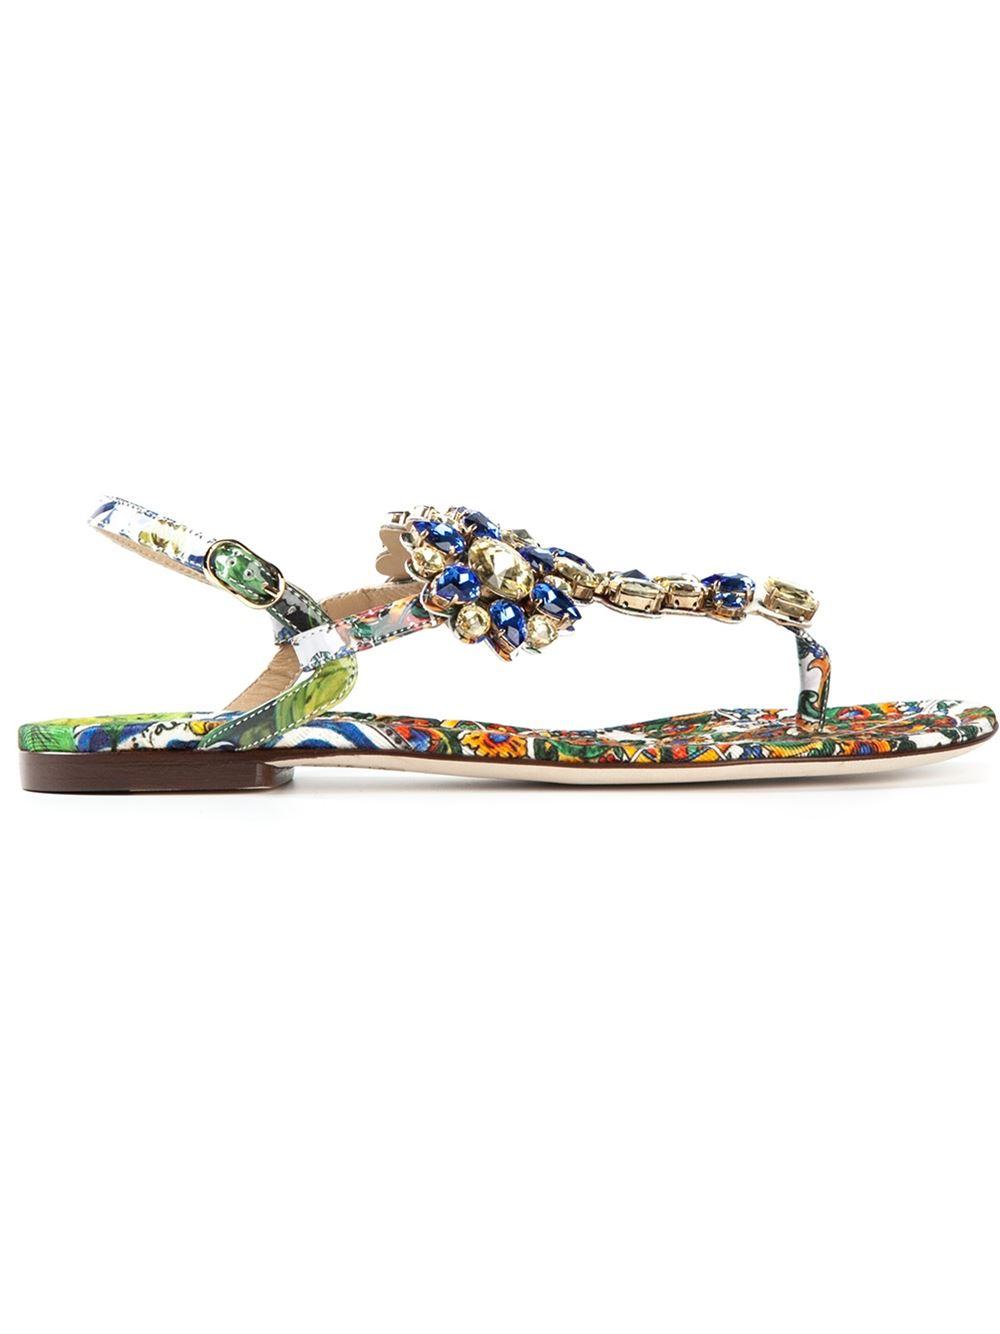 65ae64aae4c7 Lyst - Dolce   Gabbana Crystal Embellished Sandals